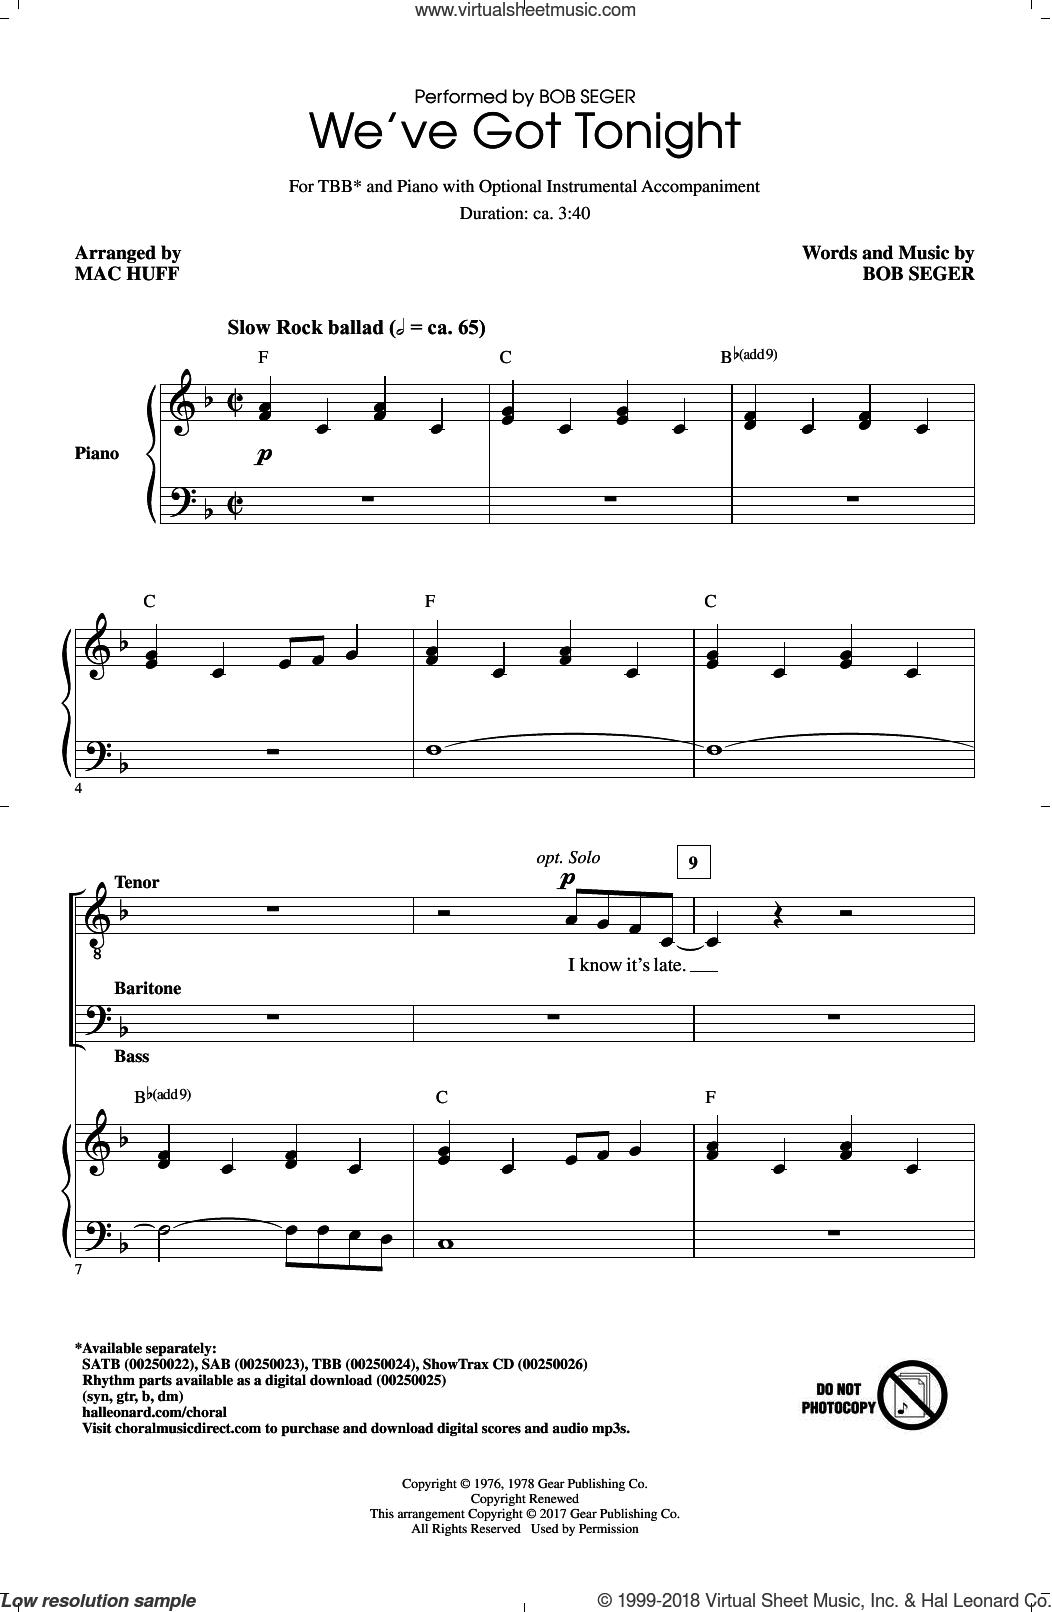 We've Got Tonight sheet music for choir (TBB: tenor, bass) by Bob Seger, Mac Huff, Kenny Rogers & Sheena Easton and Phillip Phillips, intermediate skill level